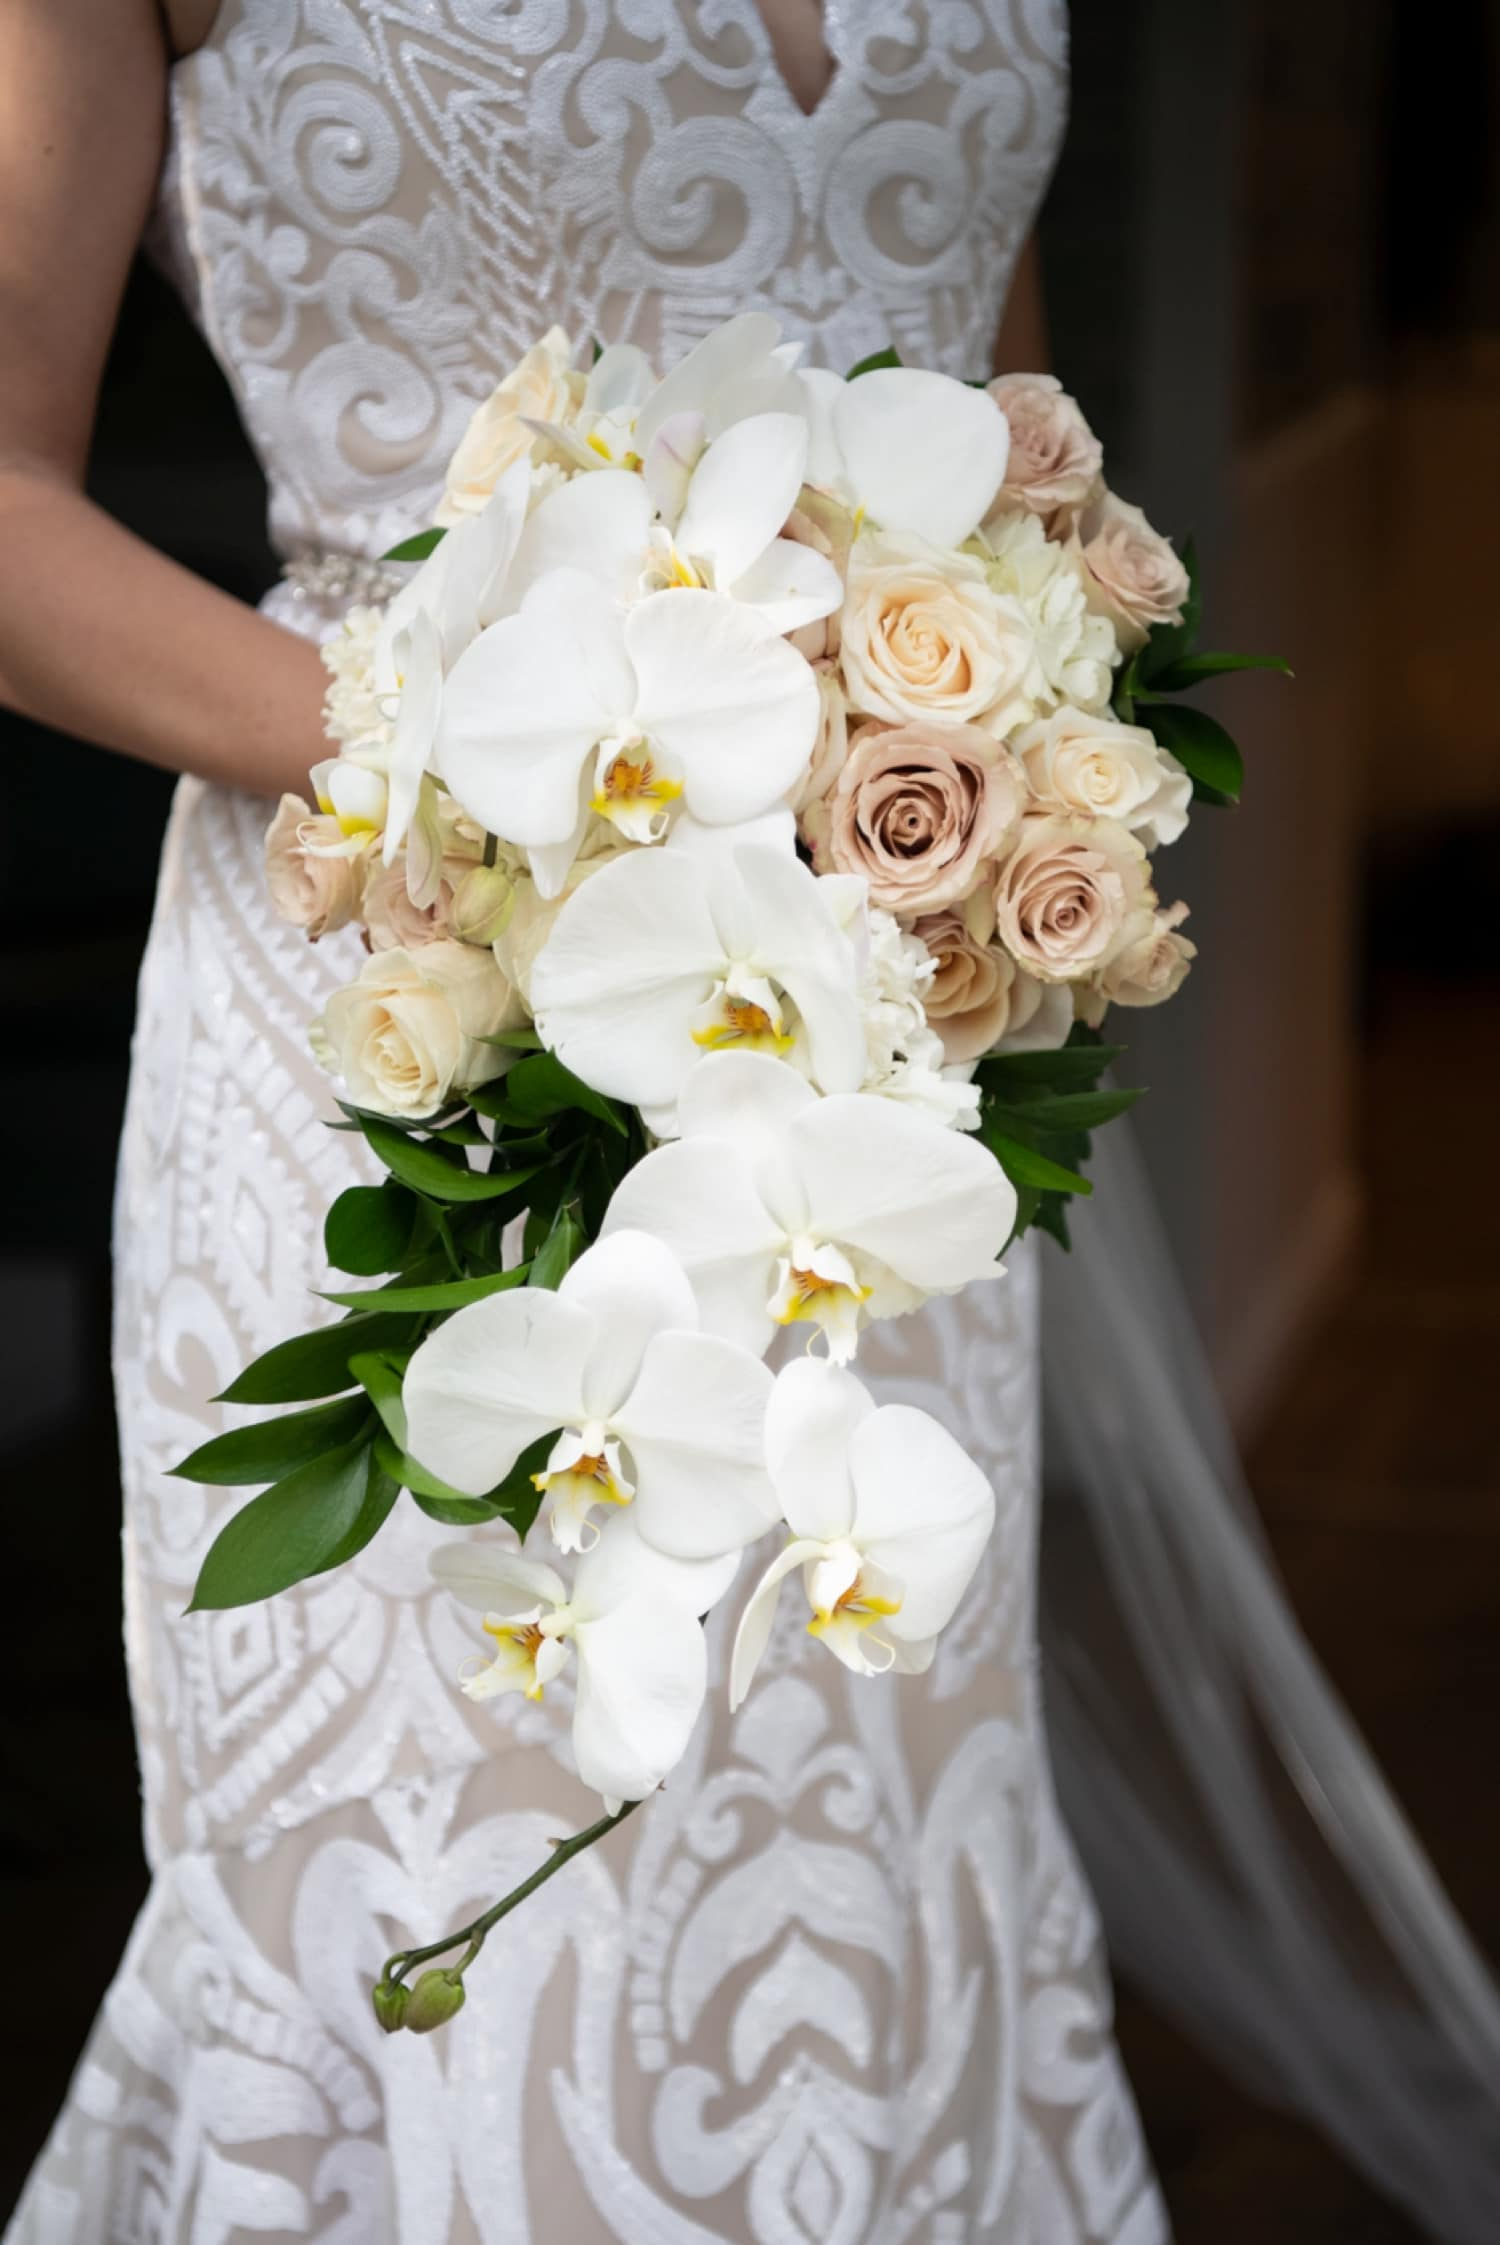 Bride holding her bouquet at her Botanica wedding